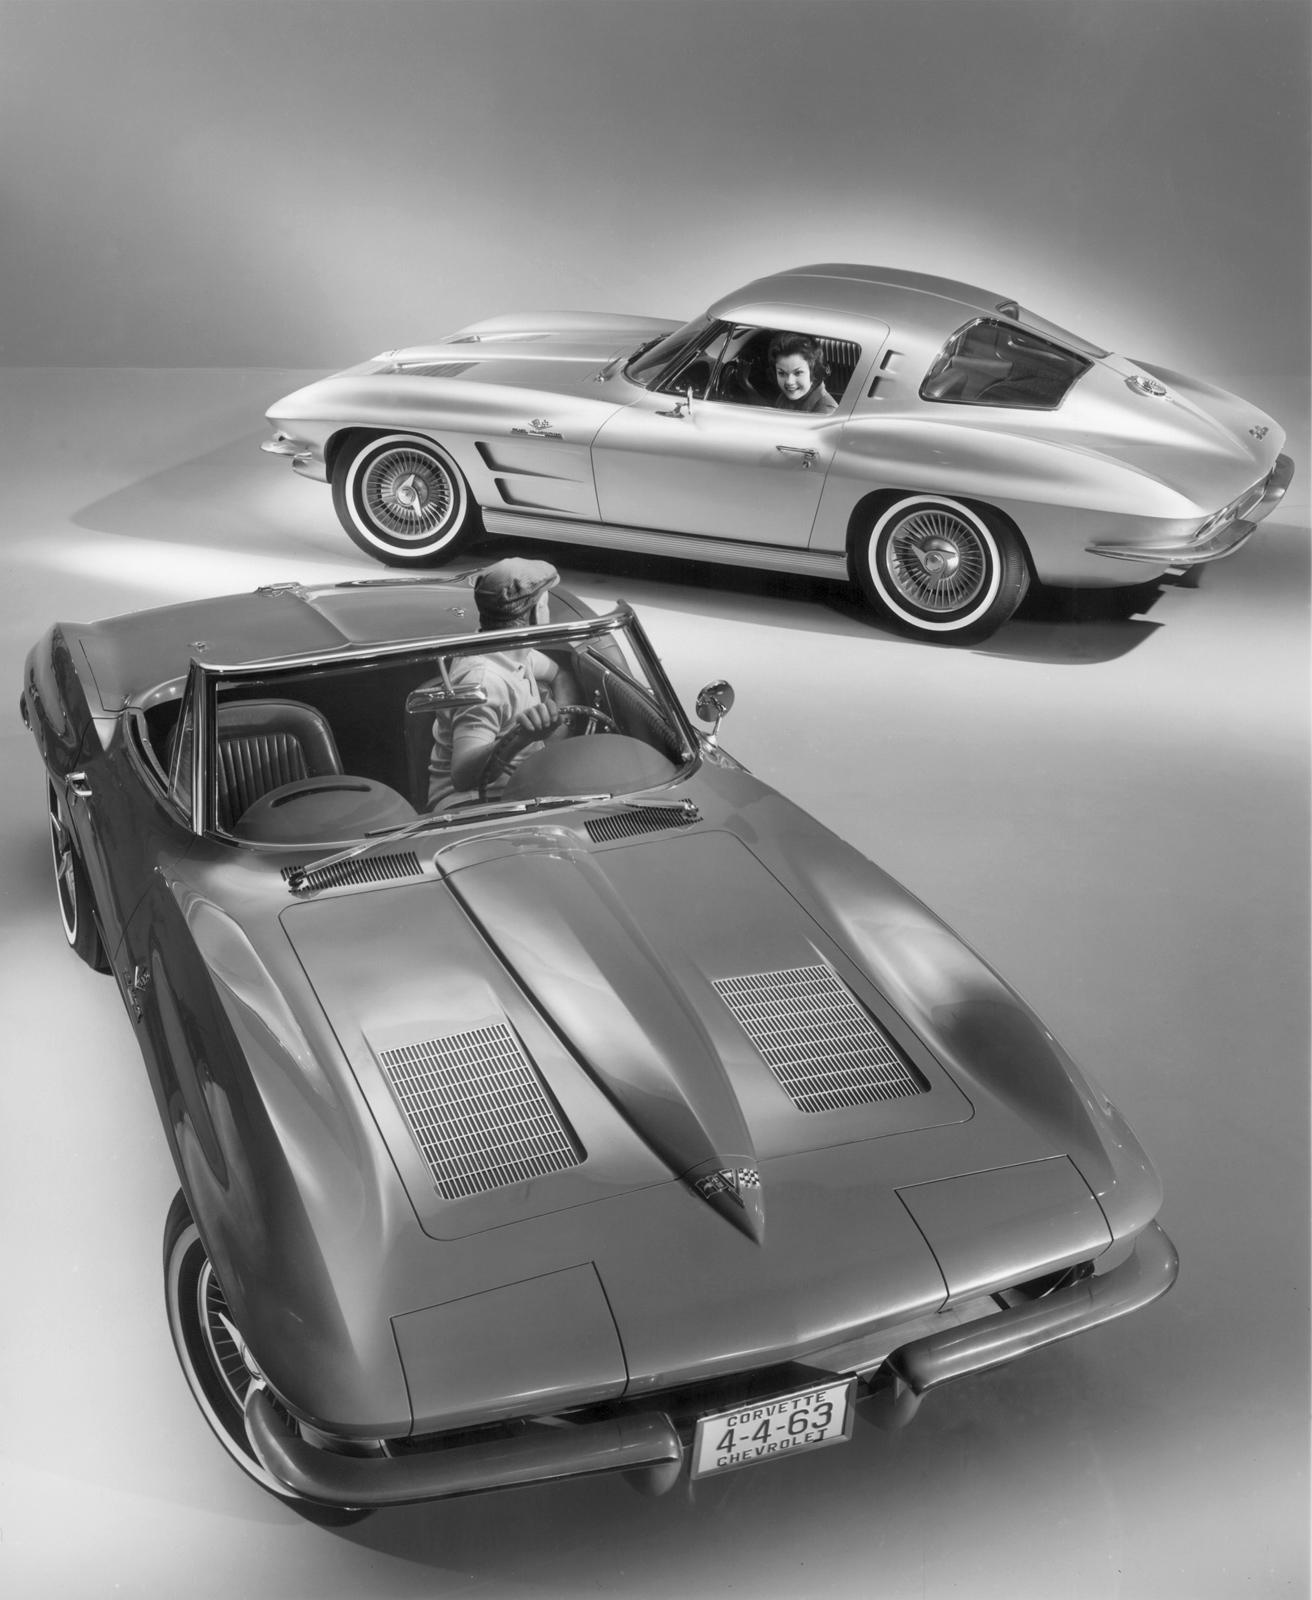 http://4.bp.blogspot.com/-wYy_JrMZGYE/TfMrXANw-dI/AAAAAAAAAIM/fLdu7cIrNCc/s1600/Corvette-C2-1963.jpg